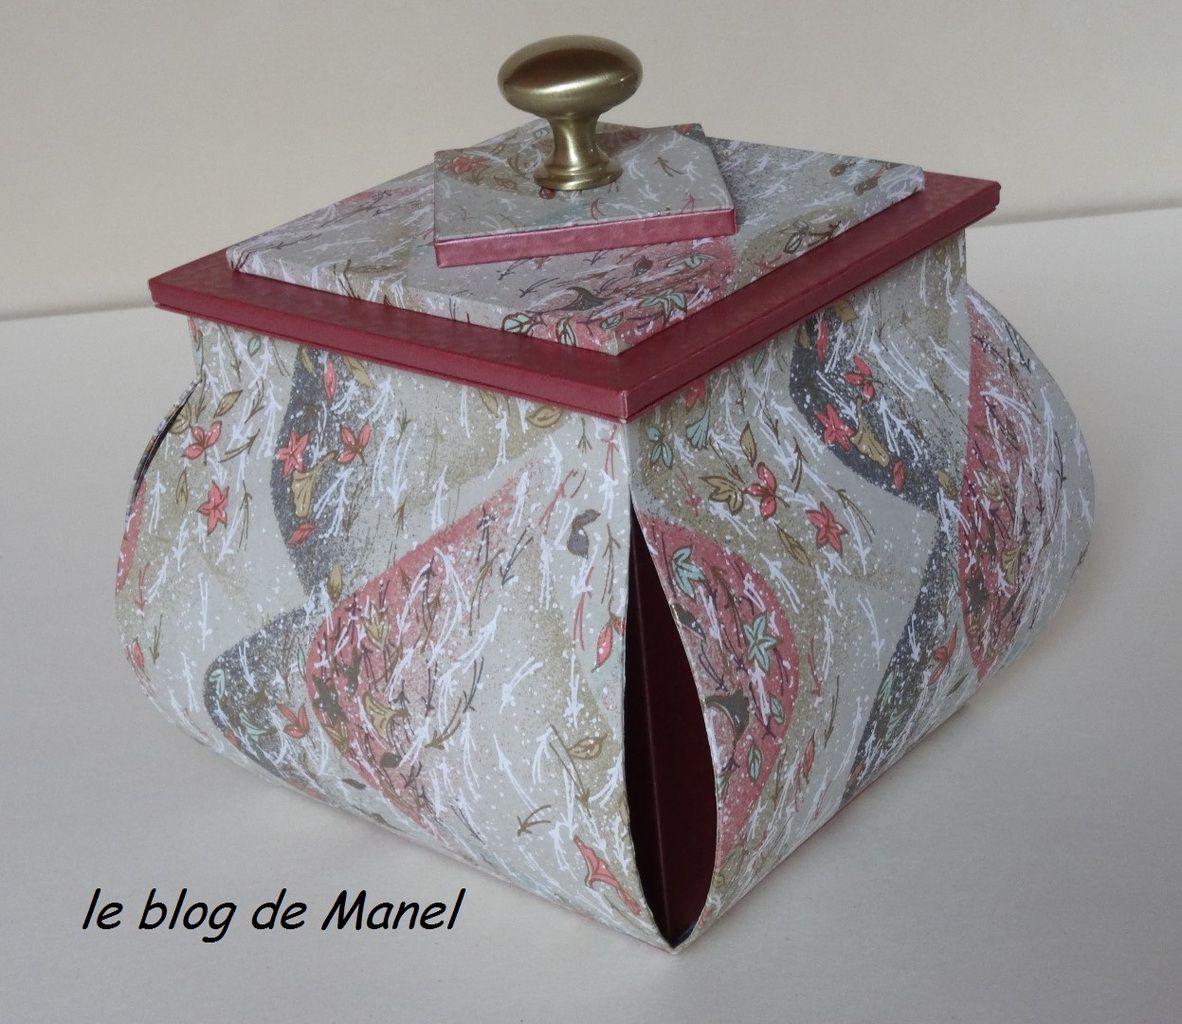 CATHERINE C/ ELEVE DE MANEL / BOITE LAMPION AVEC MEPLAT